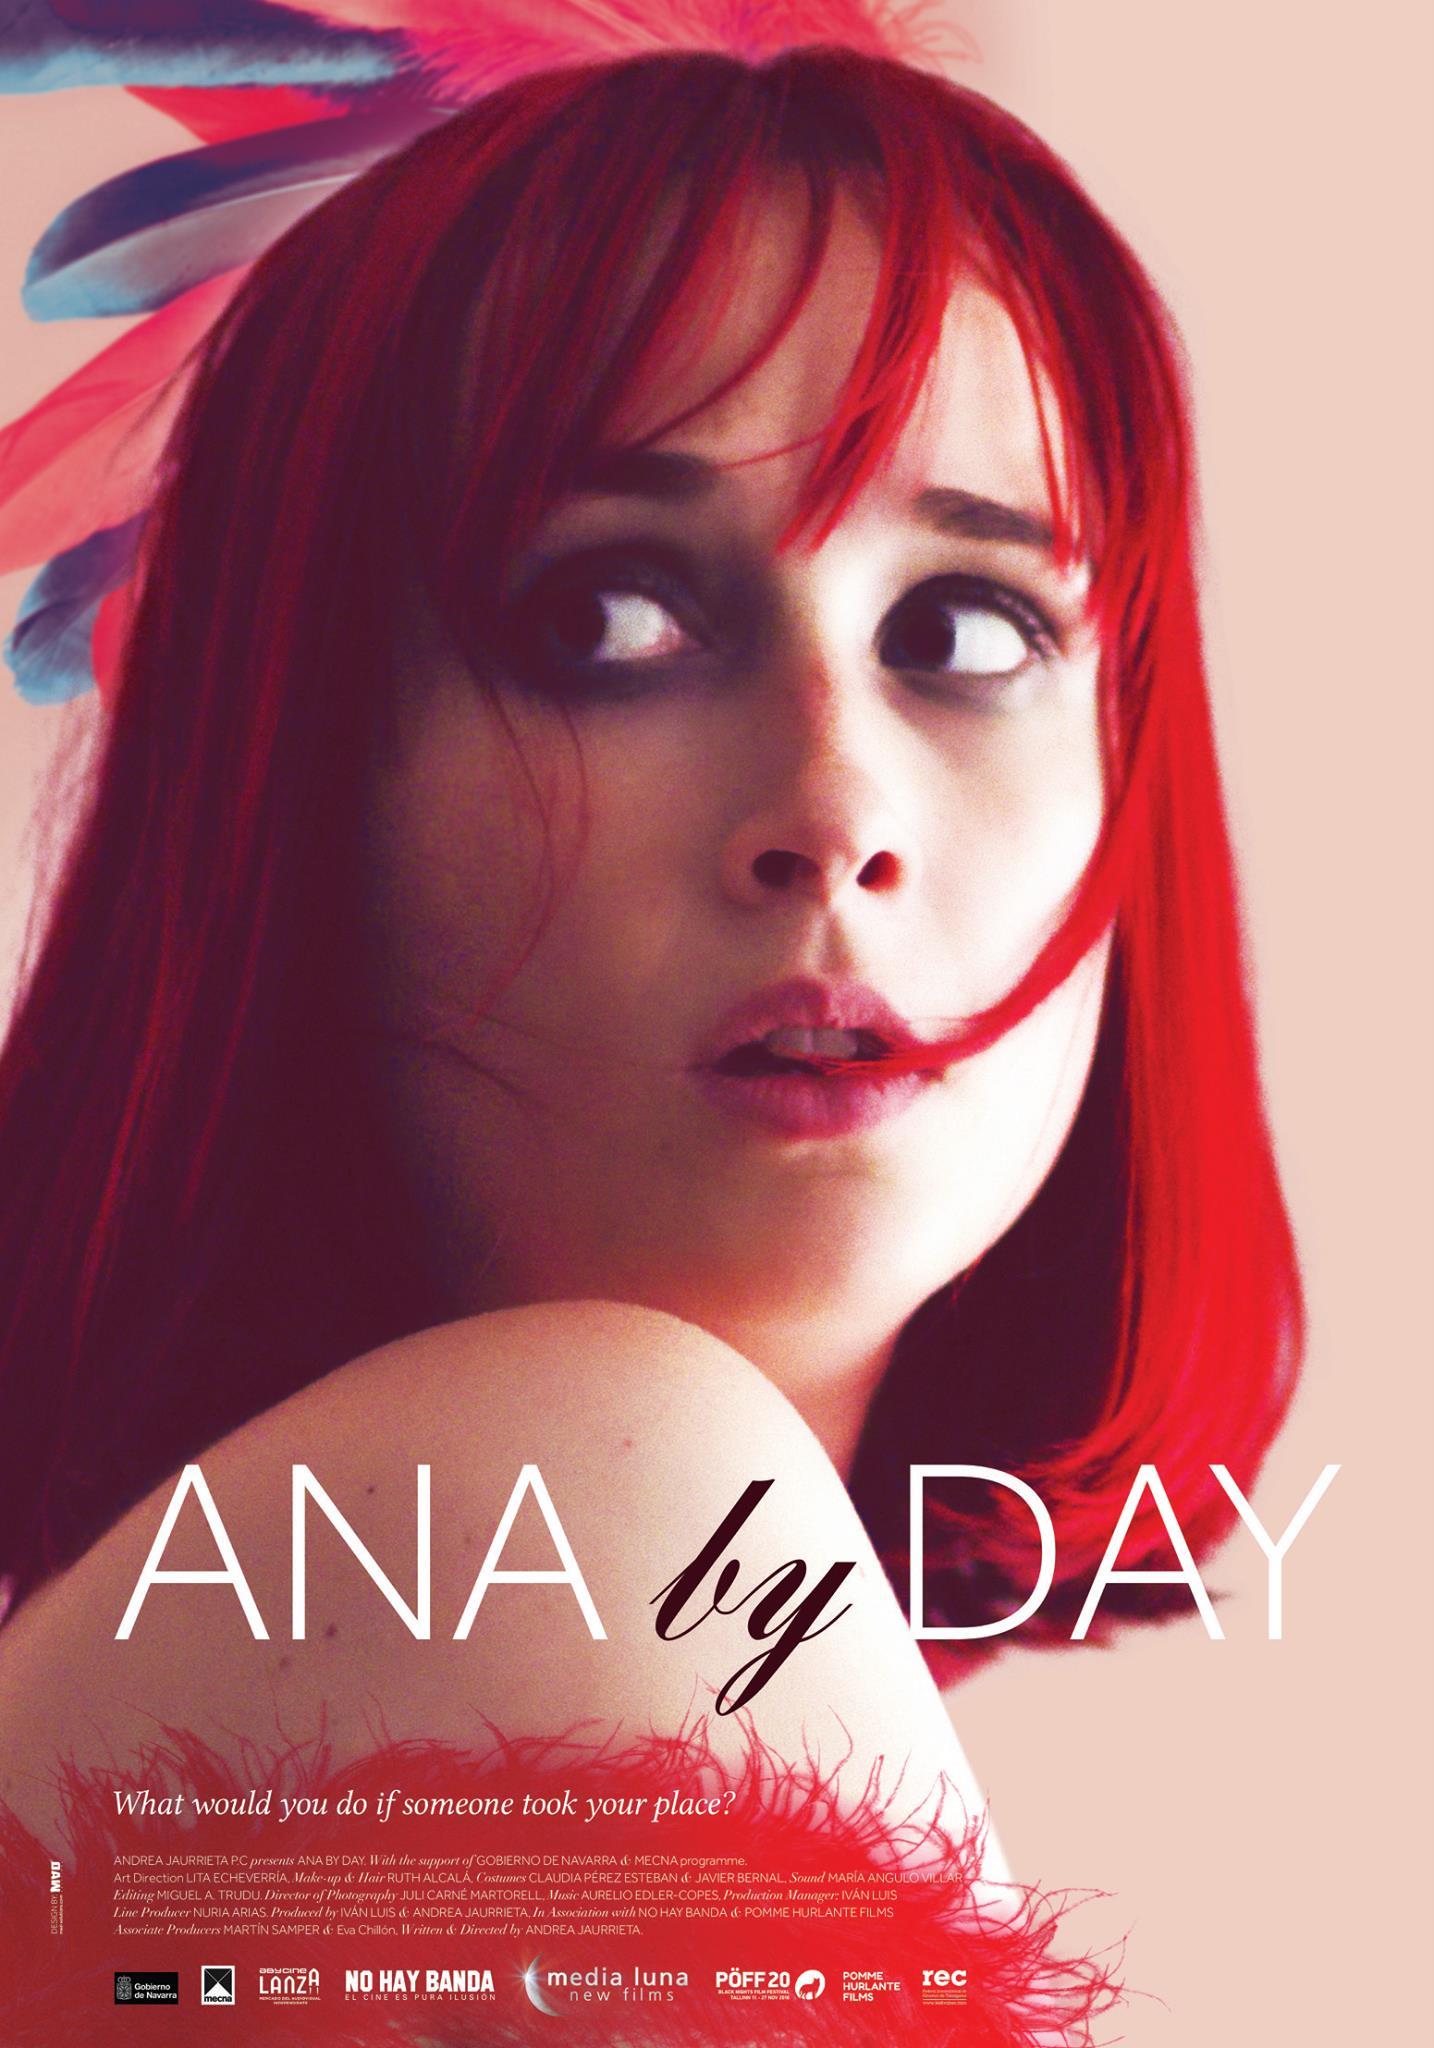 Pomme Hurlante Films - Catalog - Ana by Day - Andrea Jaurrieta